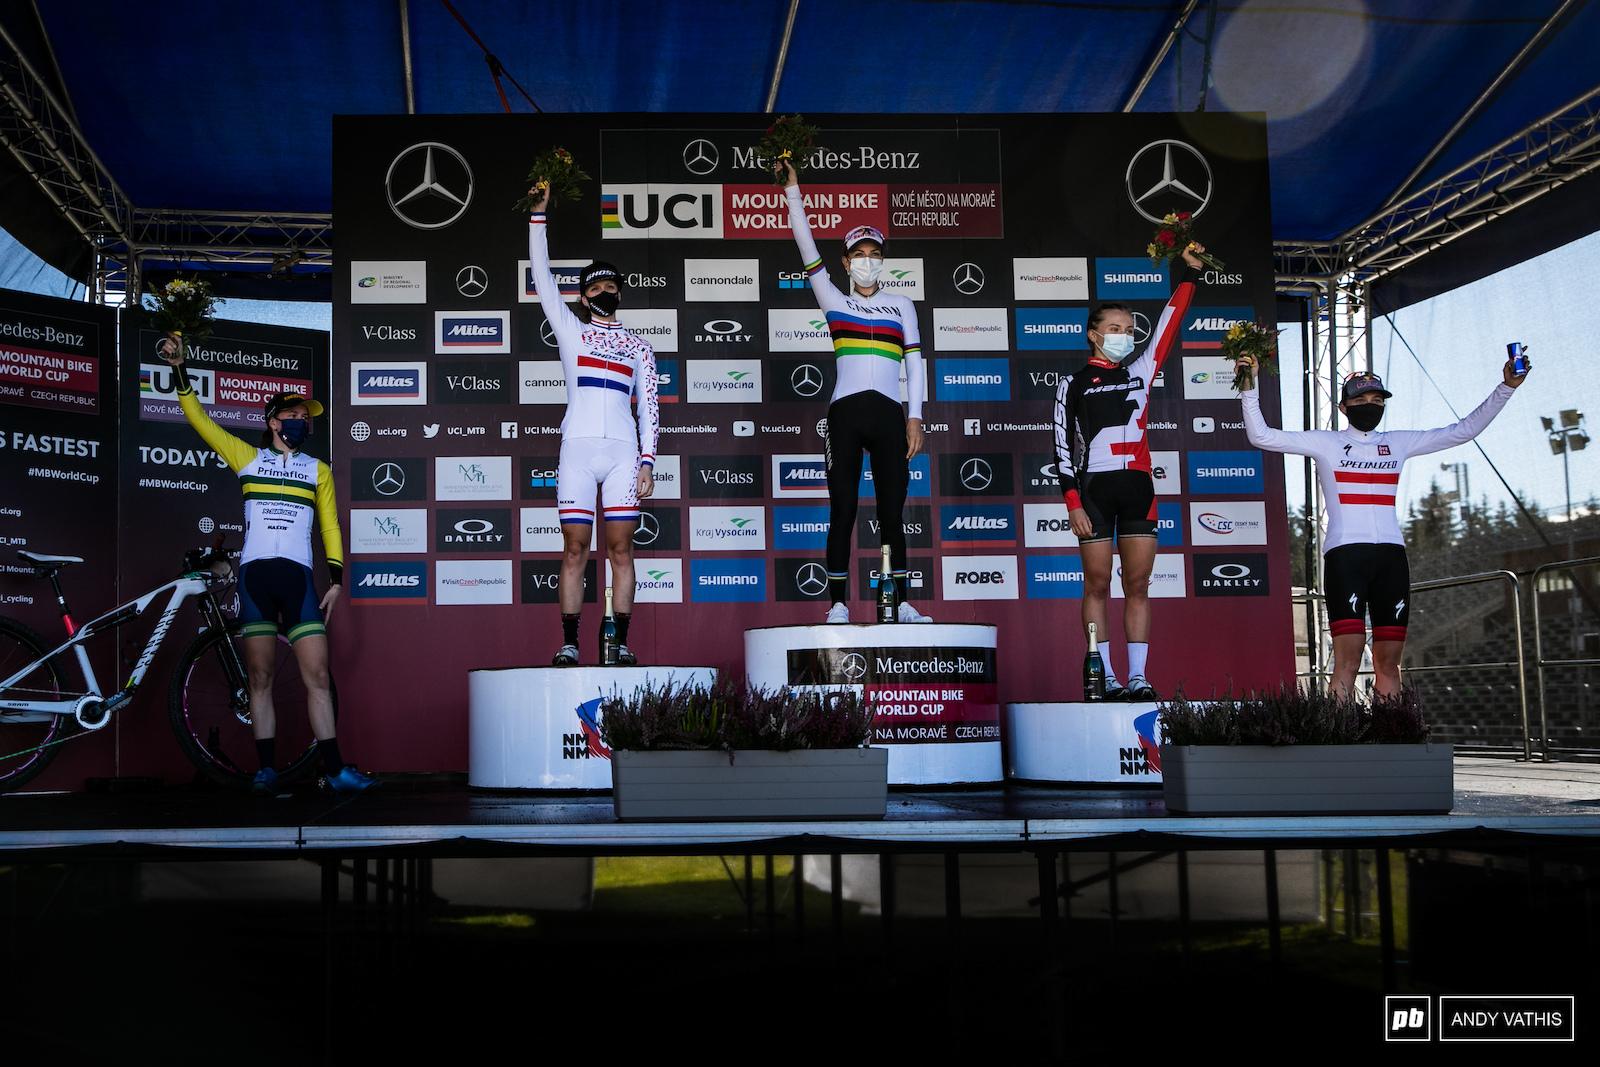 Women s elite podium - Pauline Ferrand Prevot Anne Terpstra Loana Lecomte Rebecca McConnell and Laura Stigger.